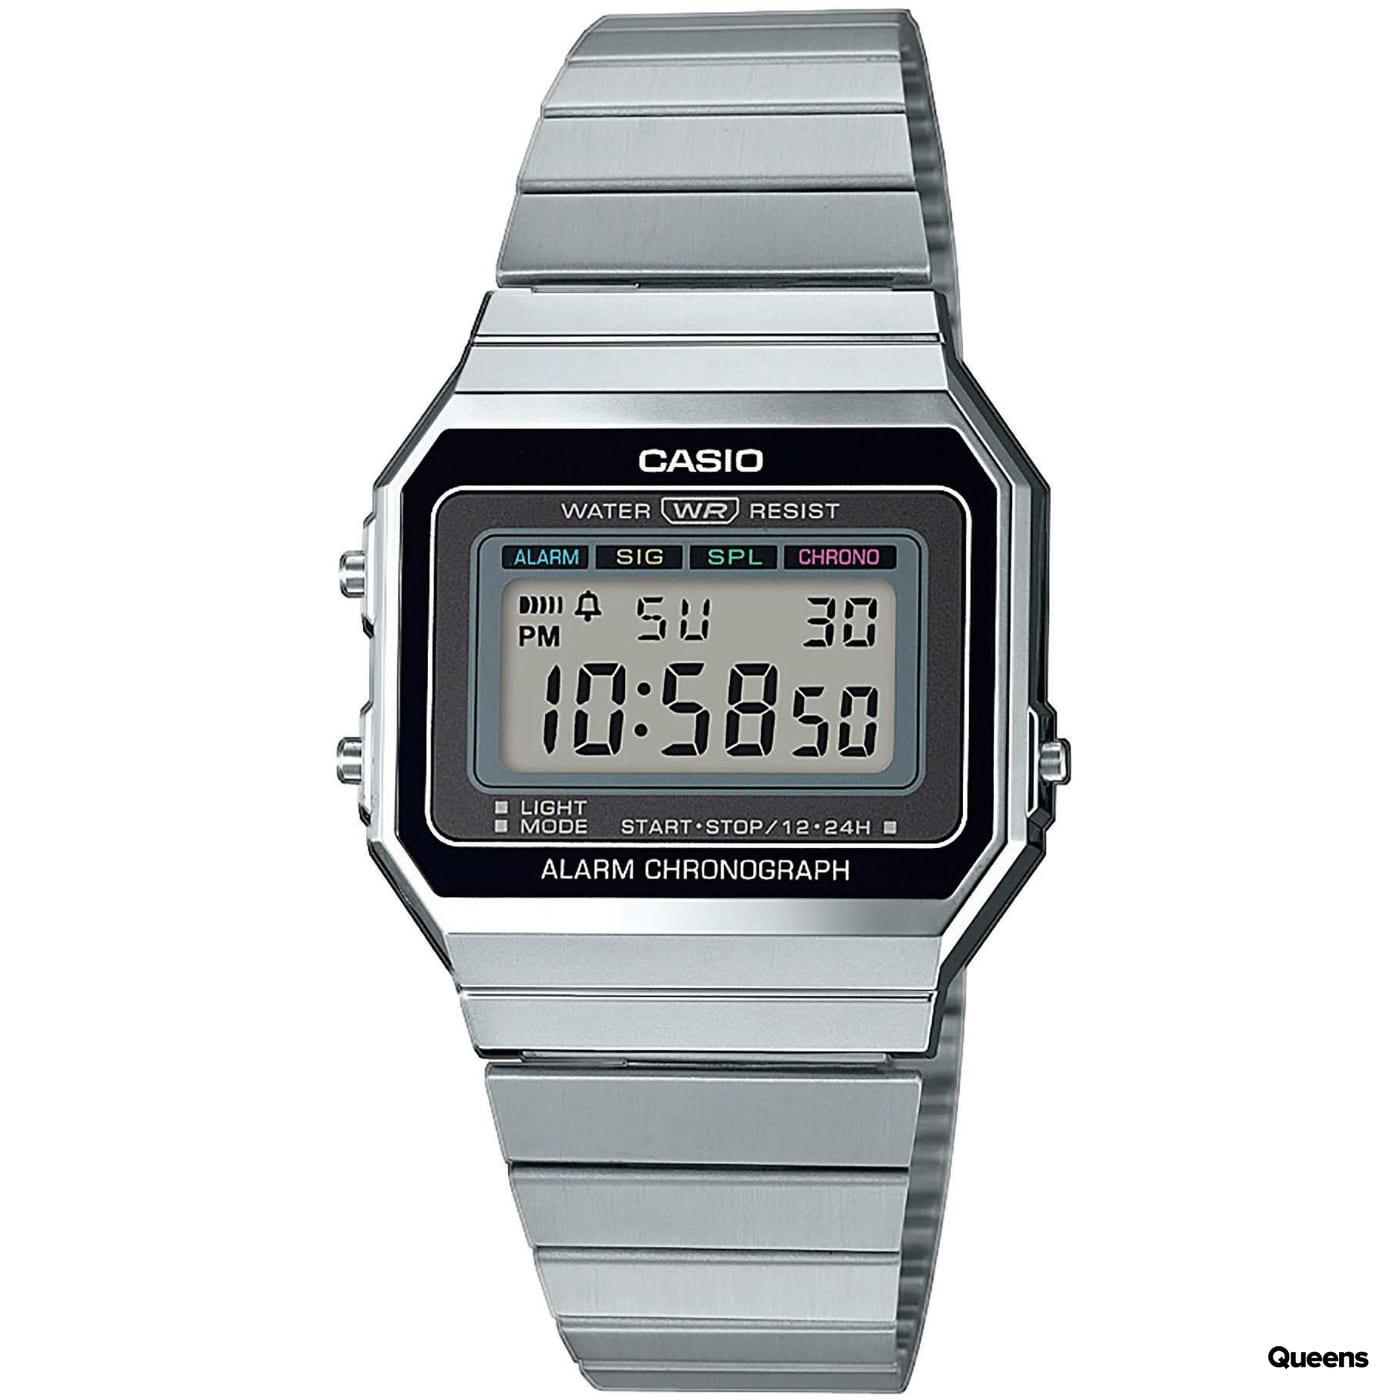 Casio A 700WE-1AEF strieborné